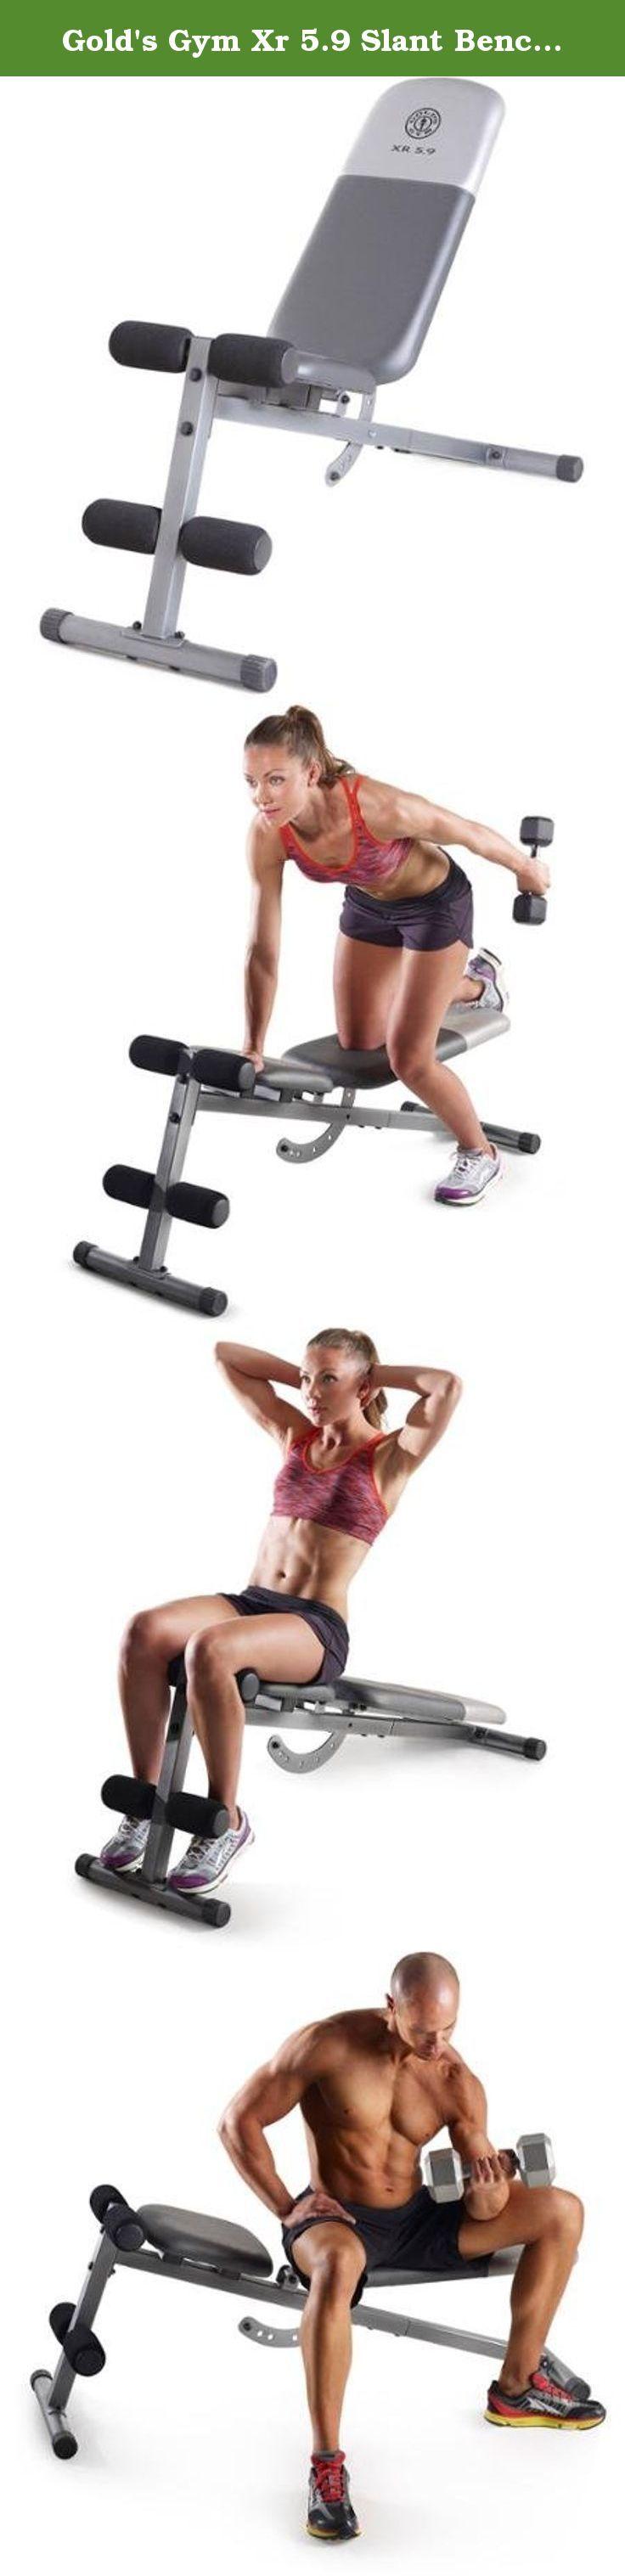 Xr Slant Bench Weight Limit